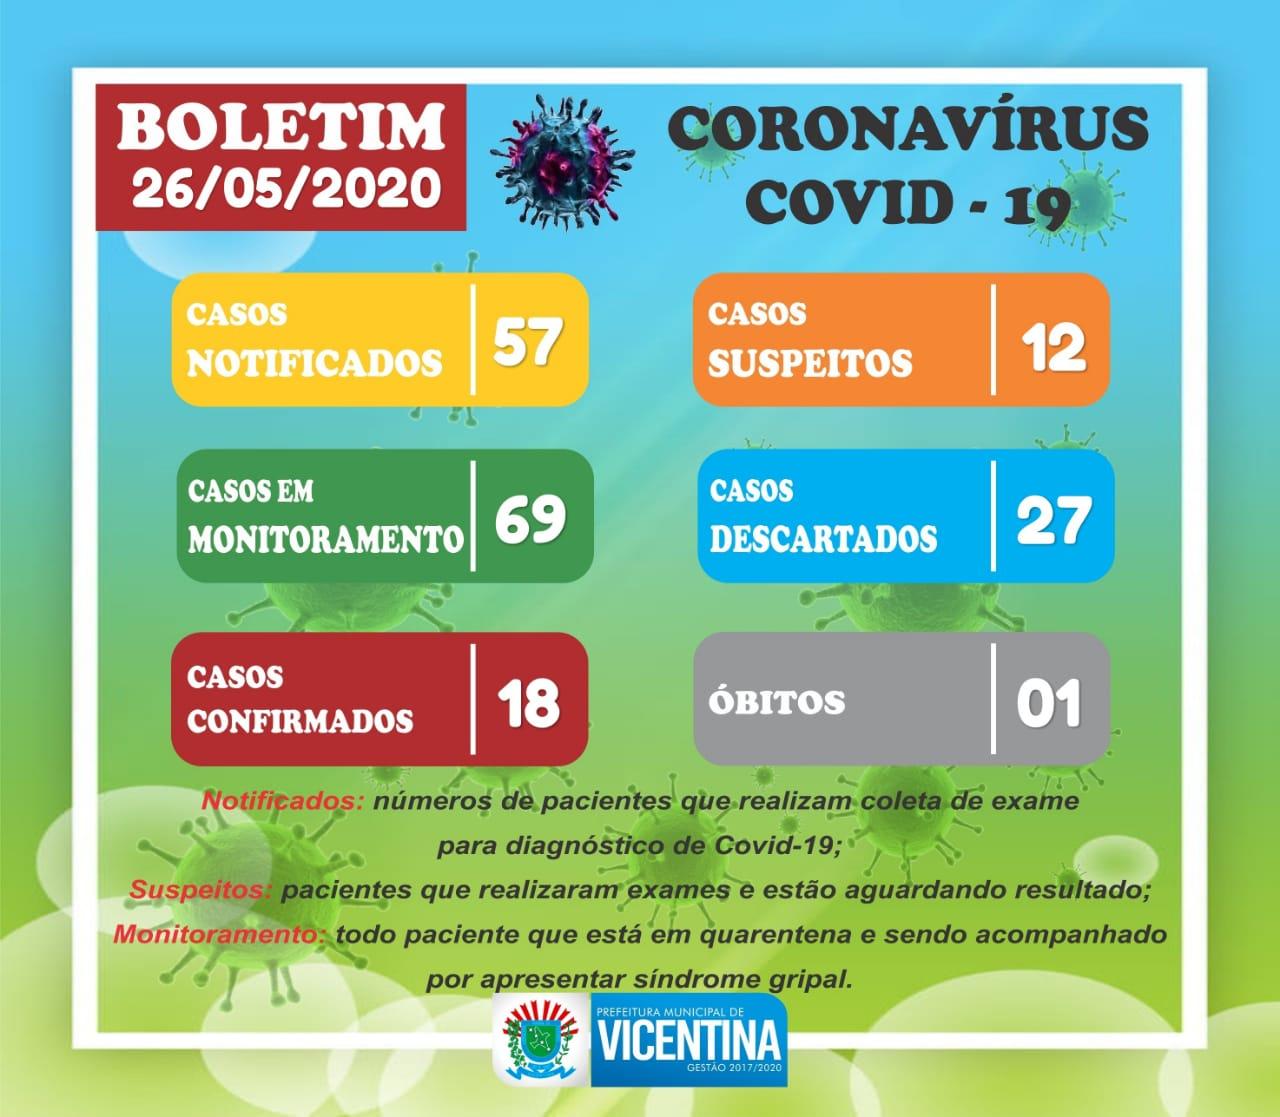 VICENTINA - BOLETIM CORONAVÍRUS